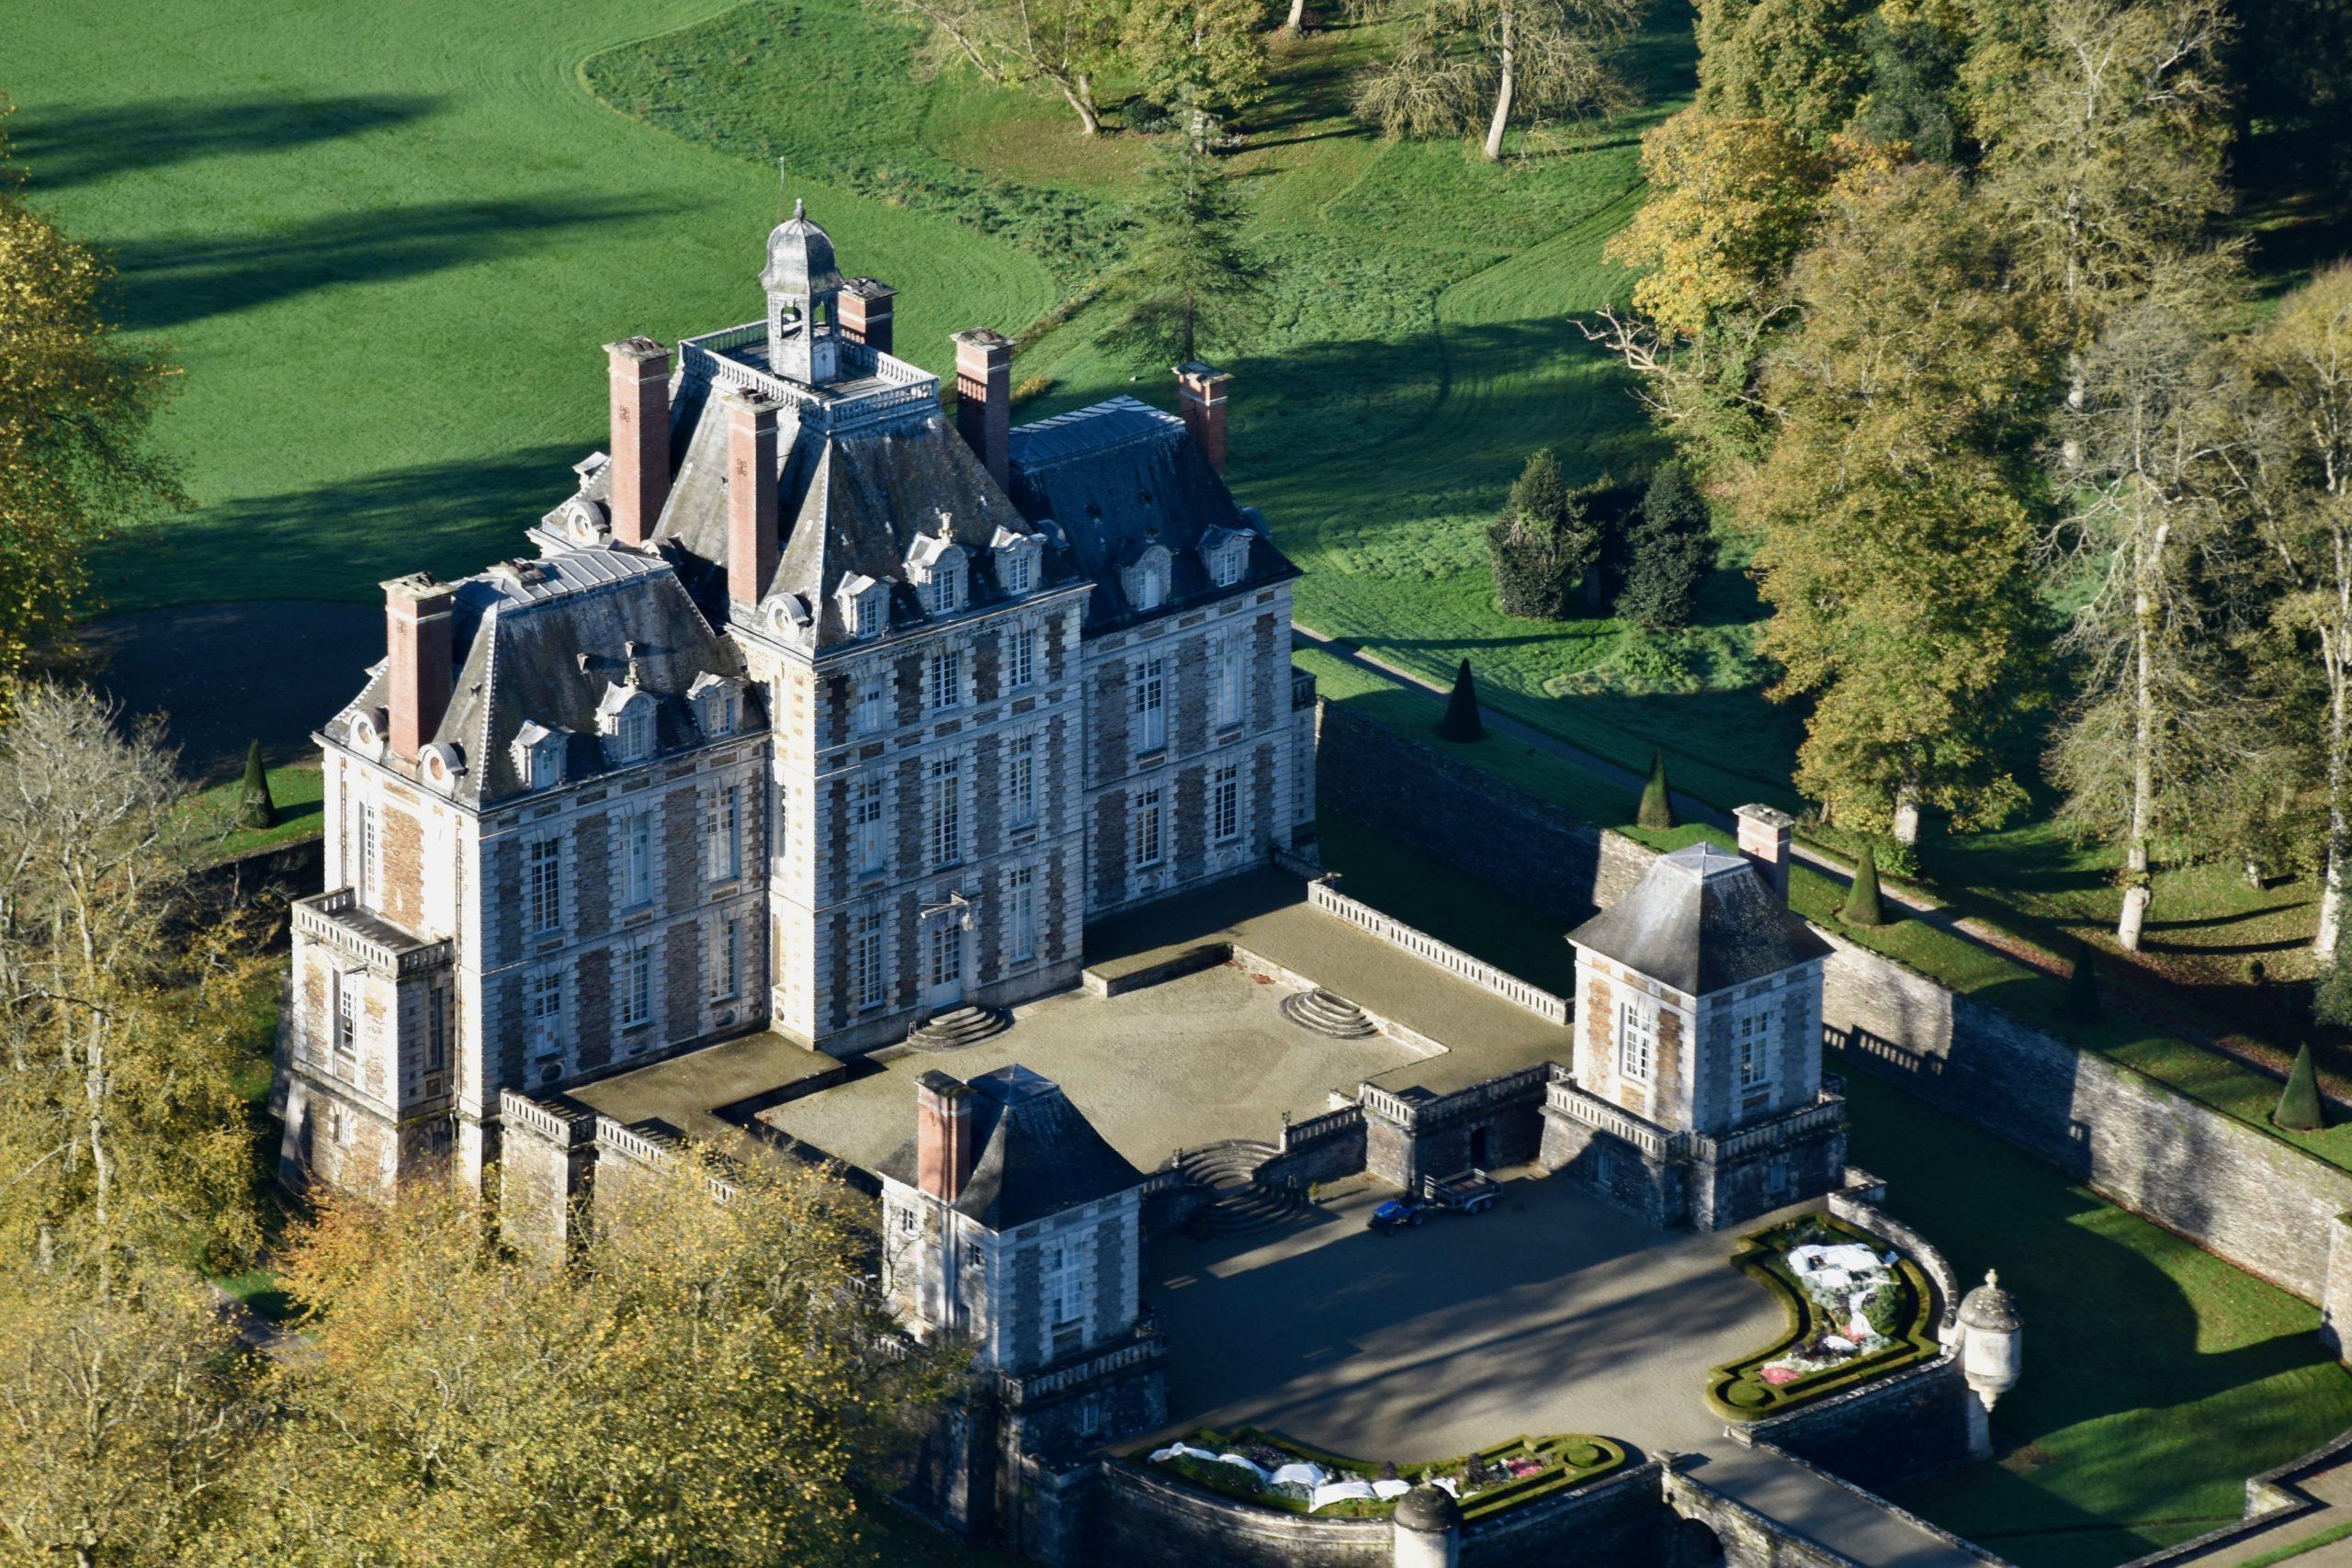 Chateau de Balleroy ©IsignyOmaha